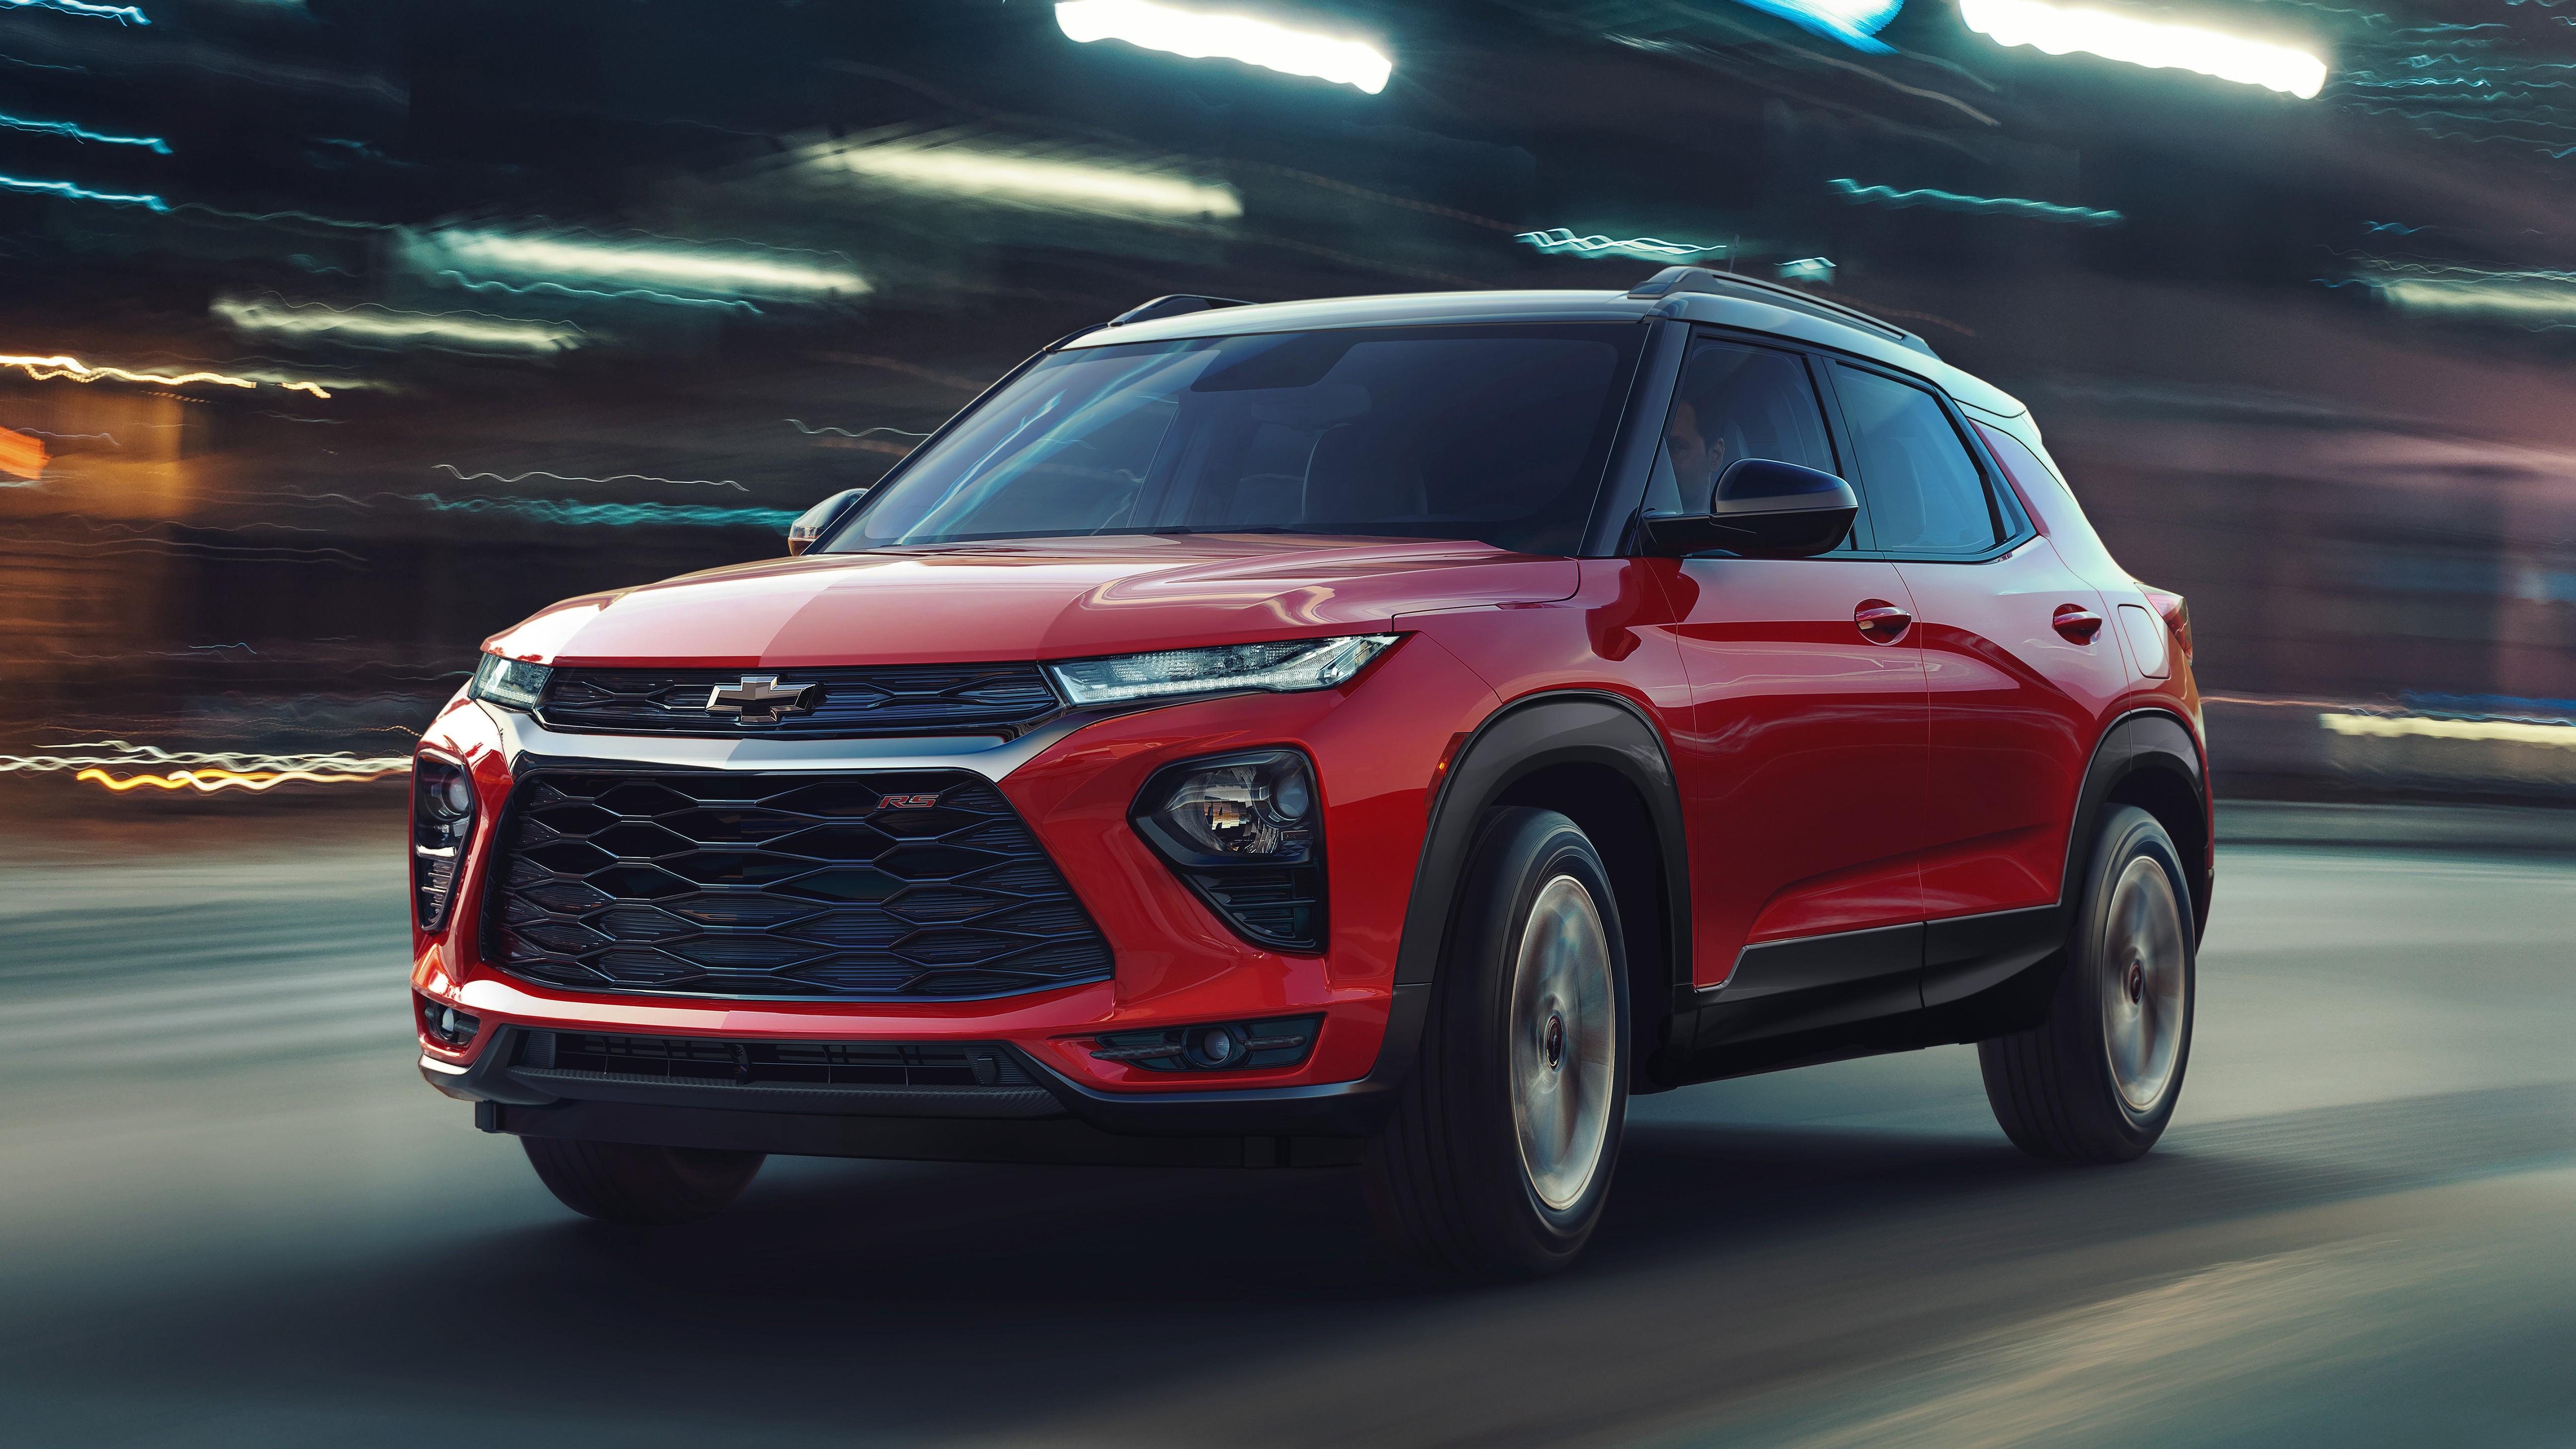 2021 chevrolet trailblazer rs 4k wallpaper   hd car